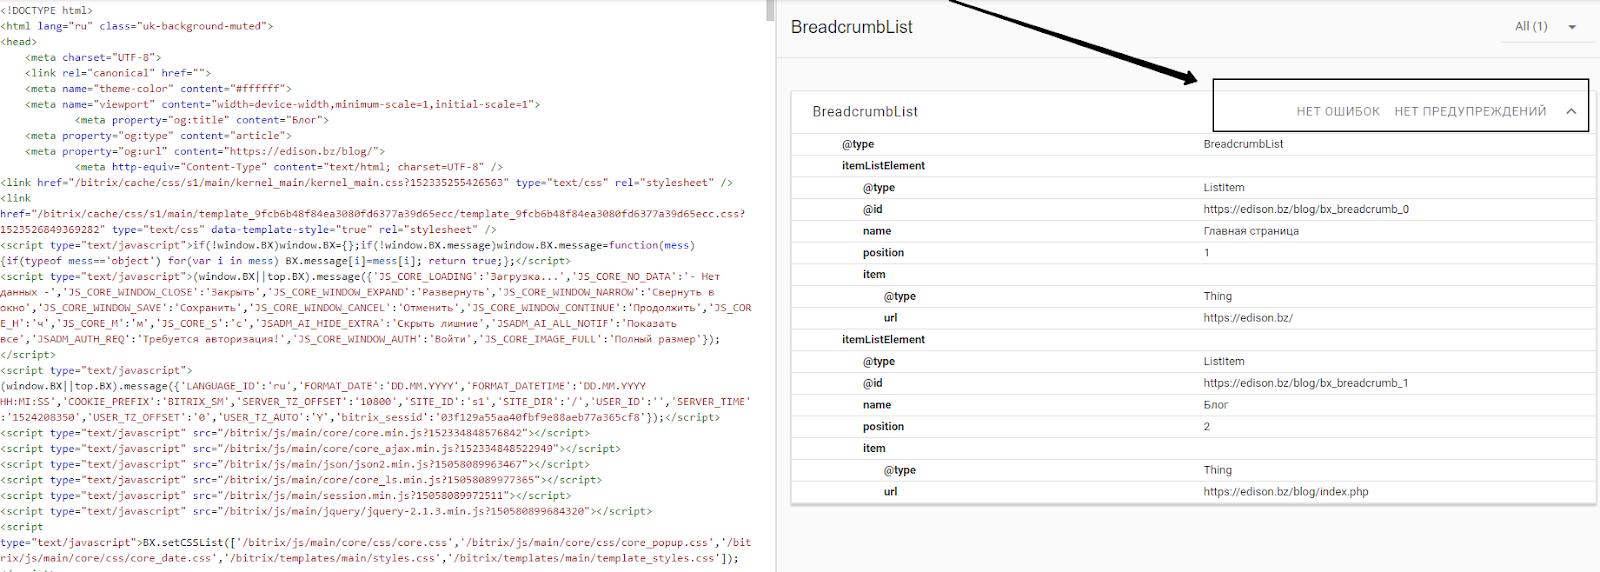 Ошибок в микроразметке у блога Edison.bz нет